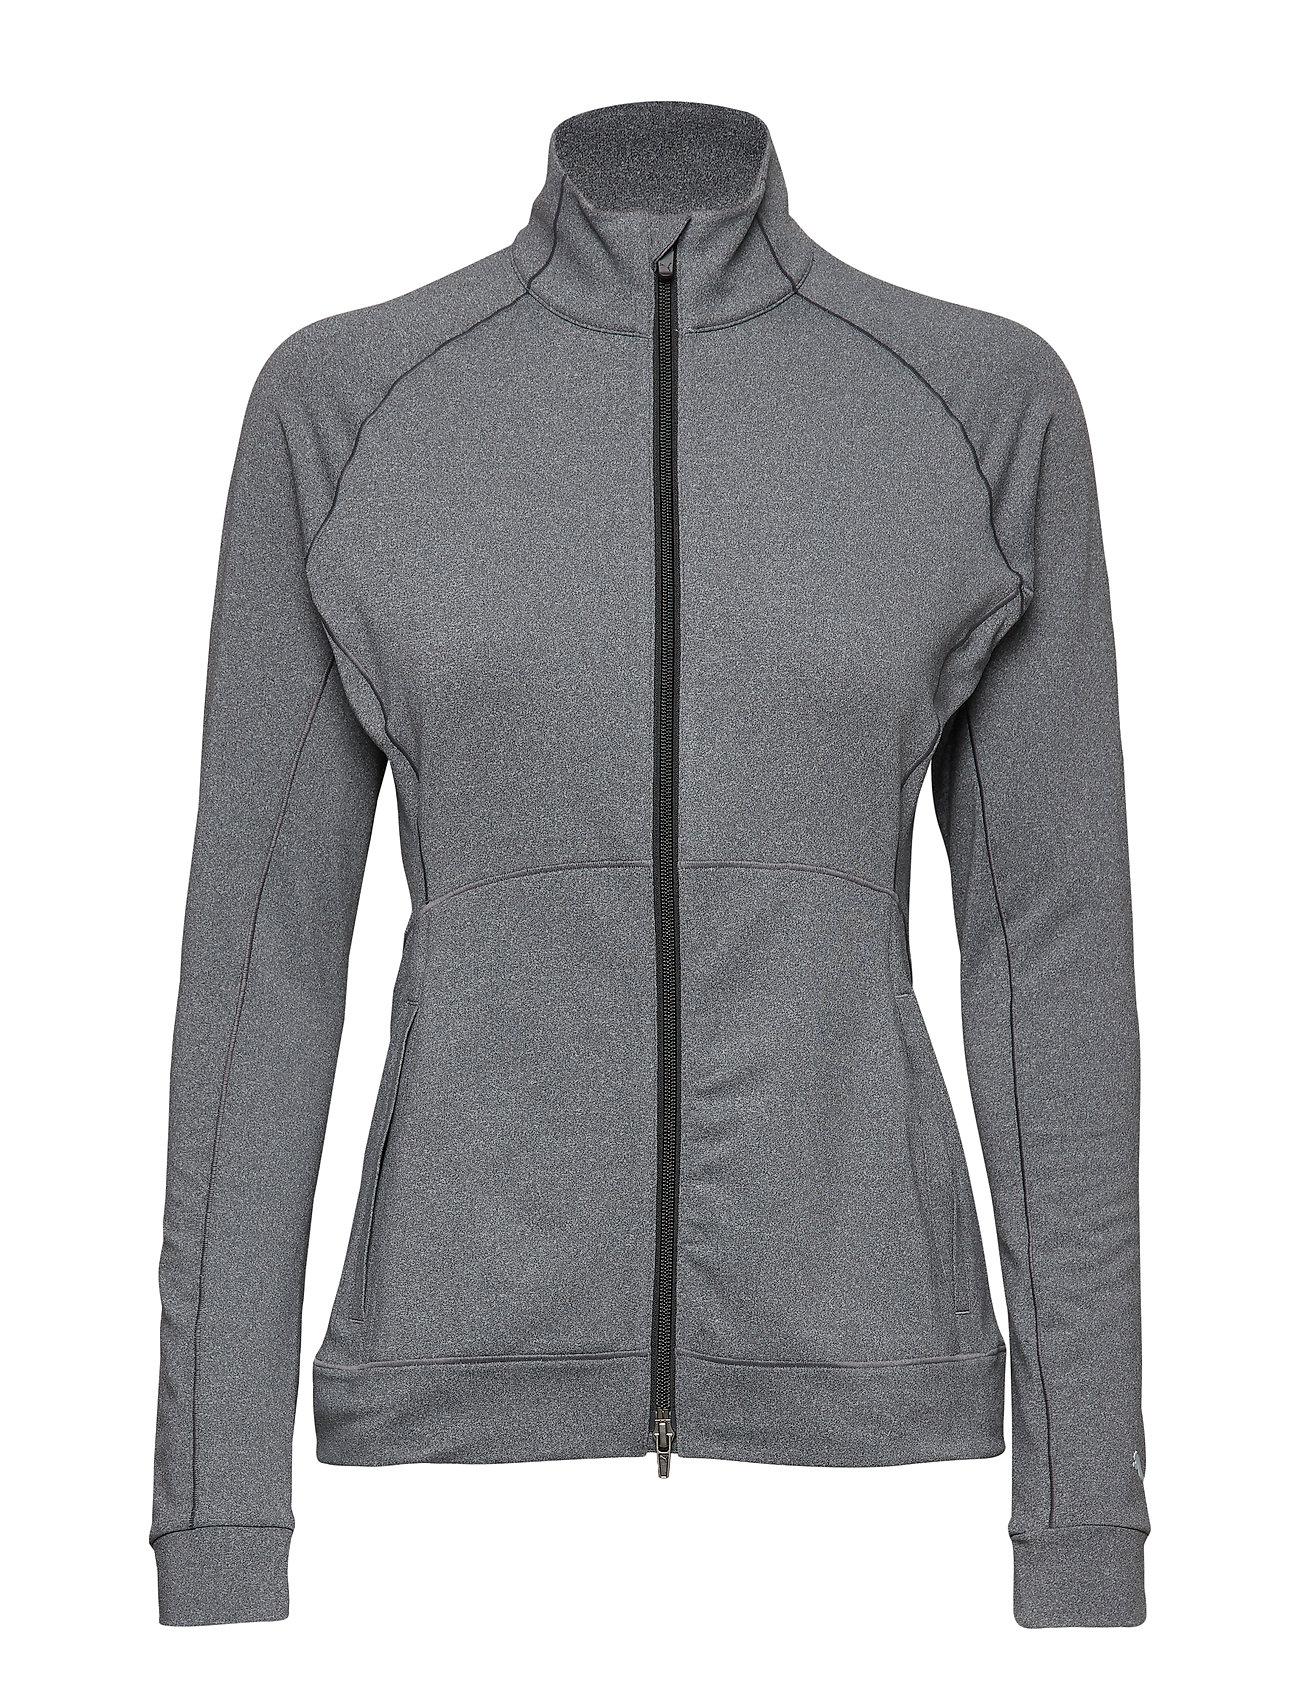 PUMA W Vented Jacket Sweat-shirt Pullover Grau PUMA GOLF